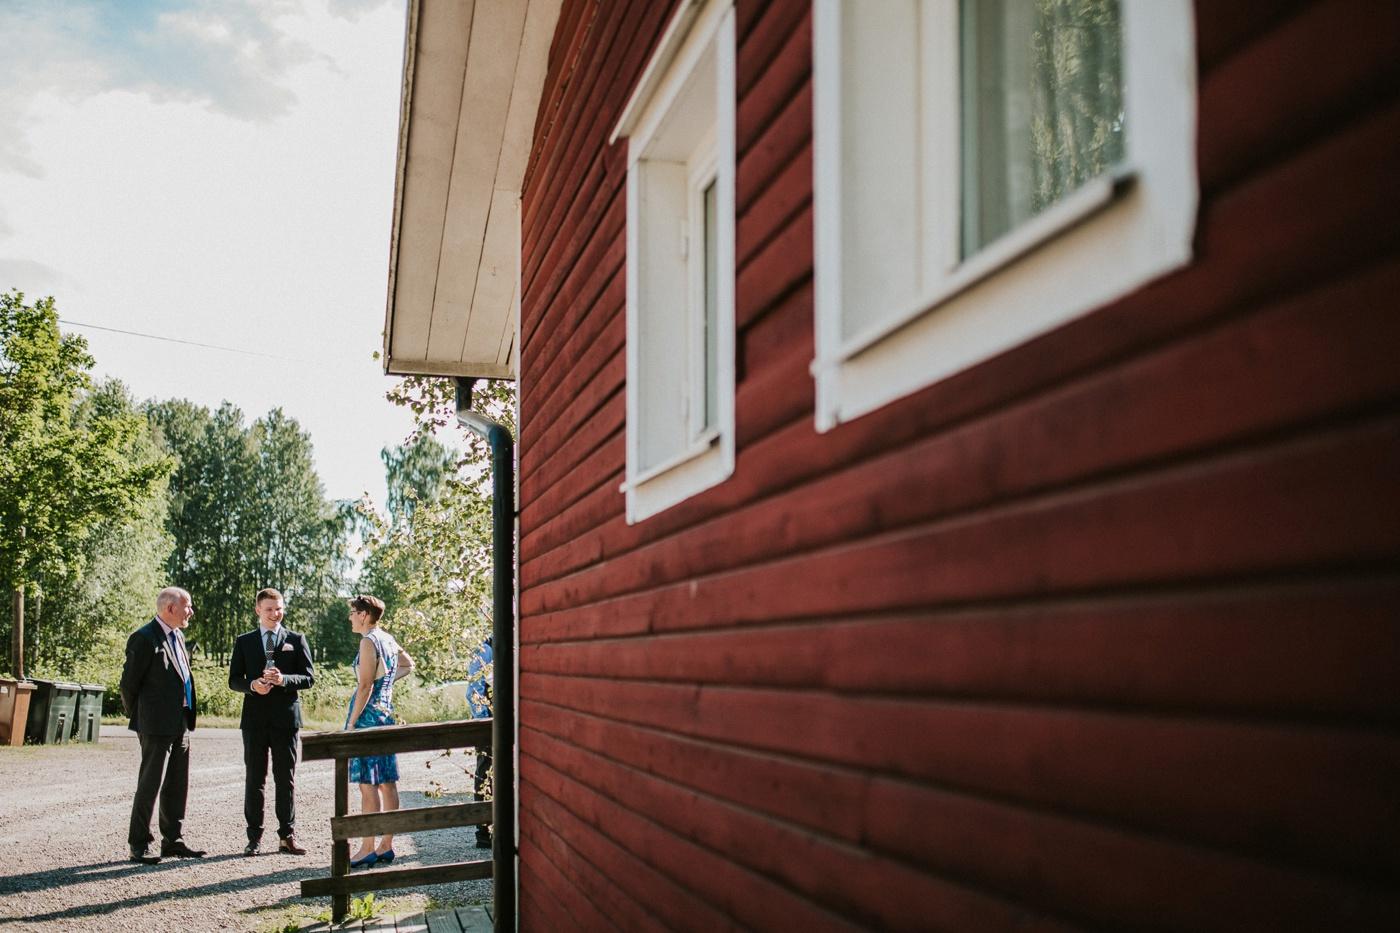 ceciliajoakim_sweden-countryside-summer-wedding_melbourne-fun-quirky-wedding-photography_65